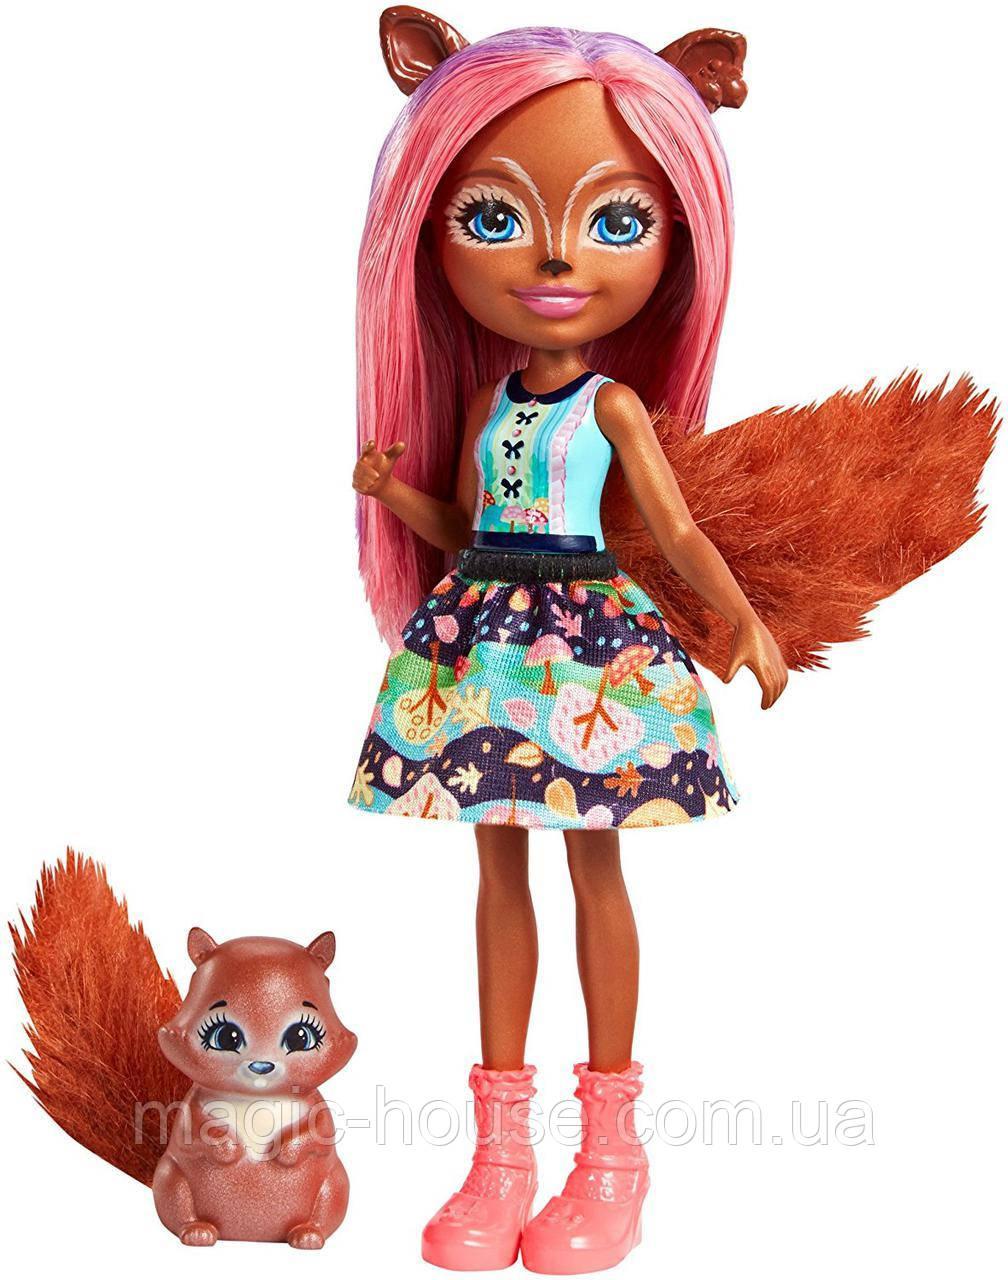 Кукла Энчантималс Белка Санча и бельченок Стампер Enchantimals Sancha Squirrel Doll & Stumper